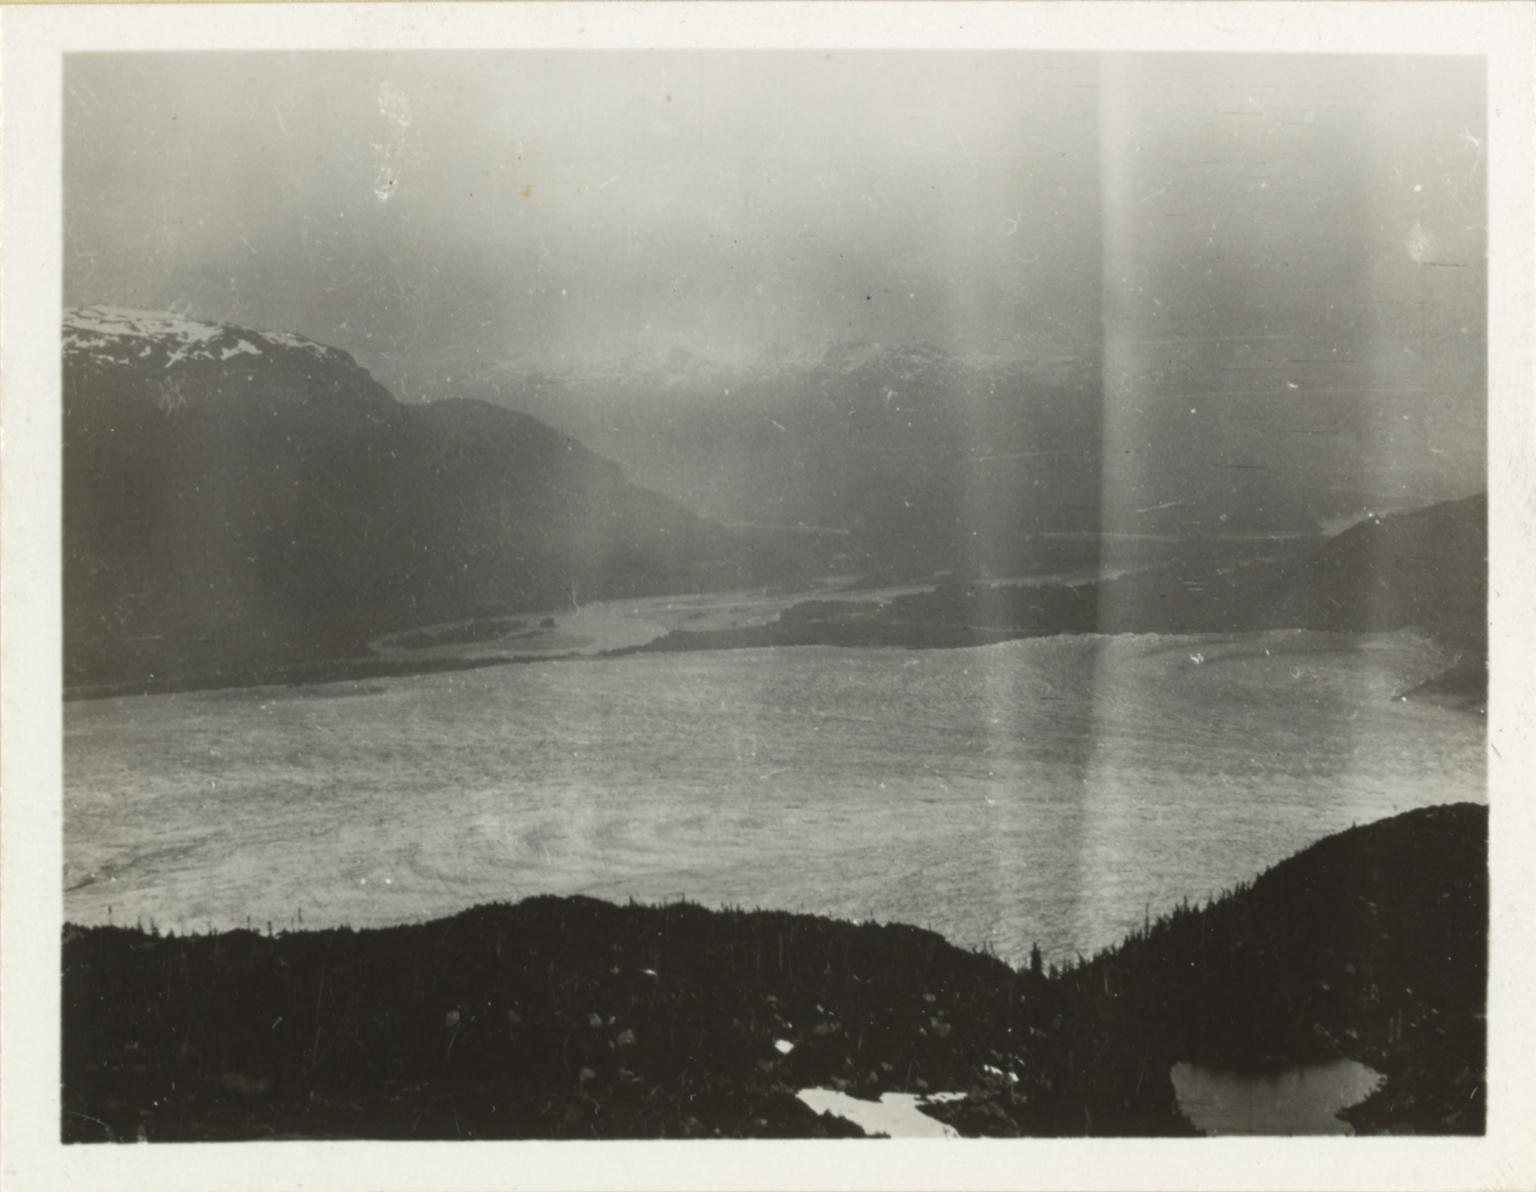 Great Glacier, Alaska and British Columbia